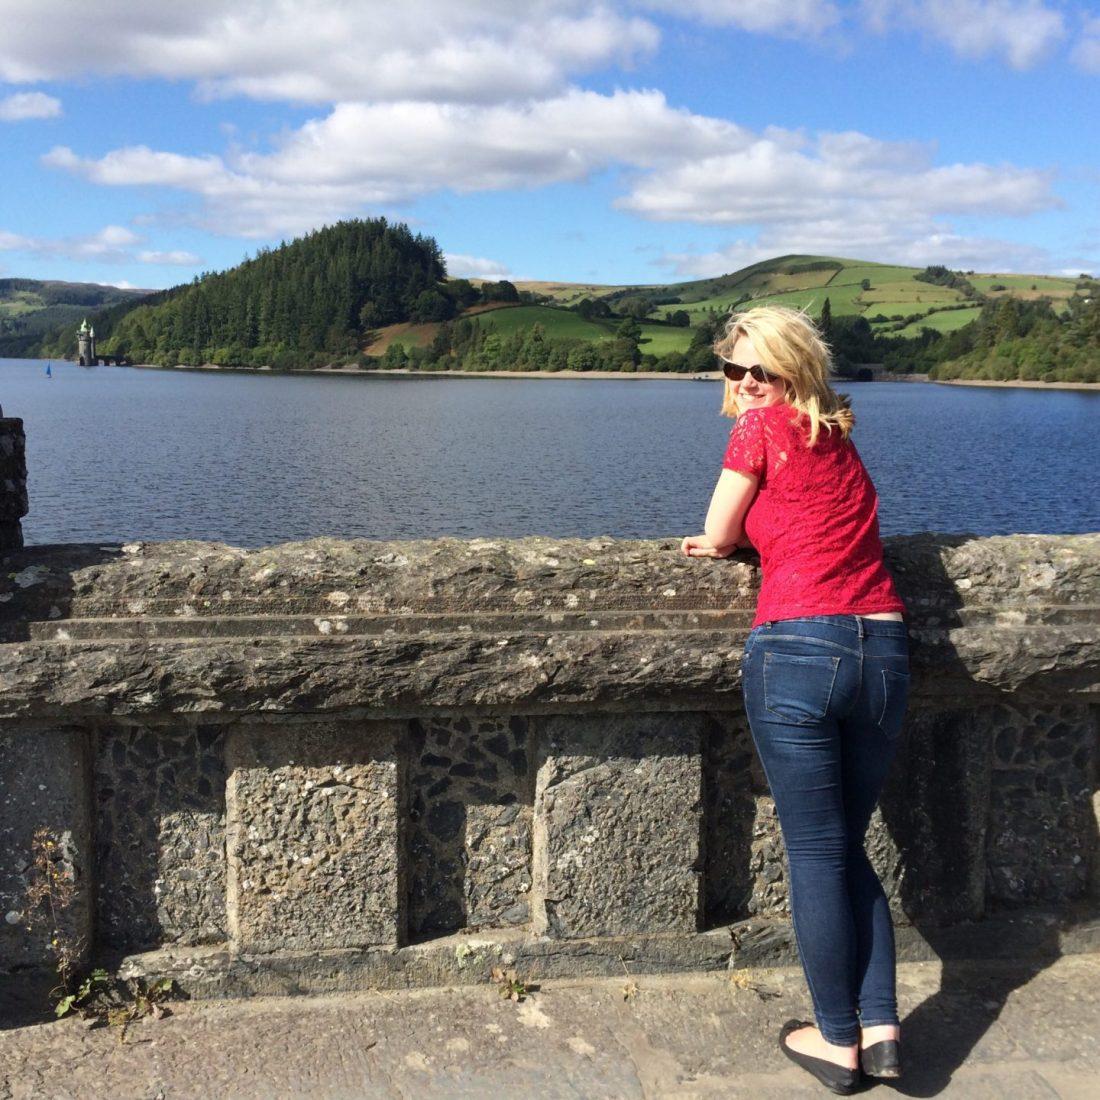 Laura on the bridge overlooking the lake